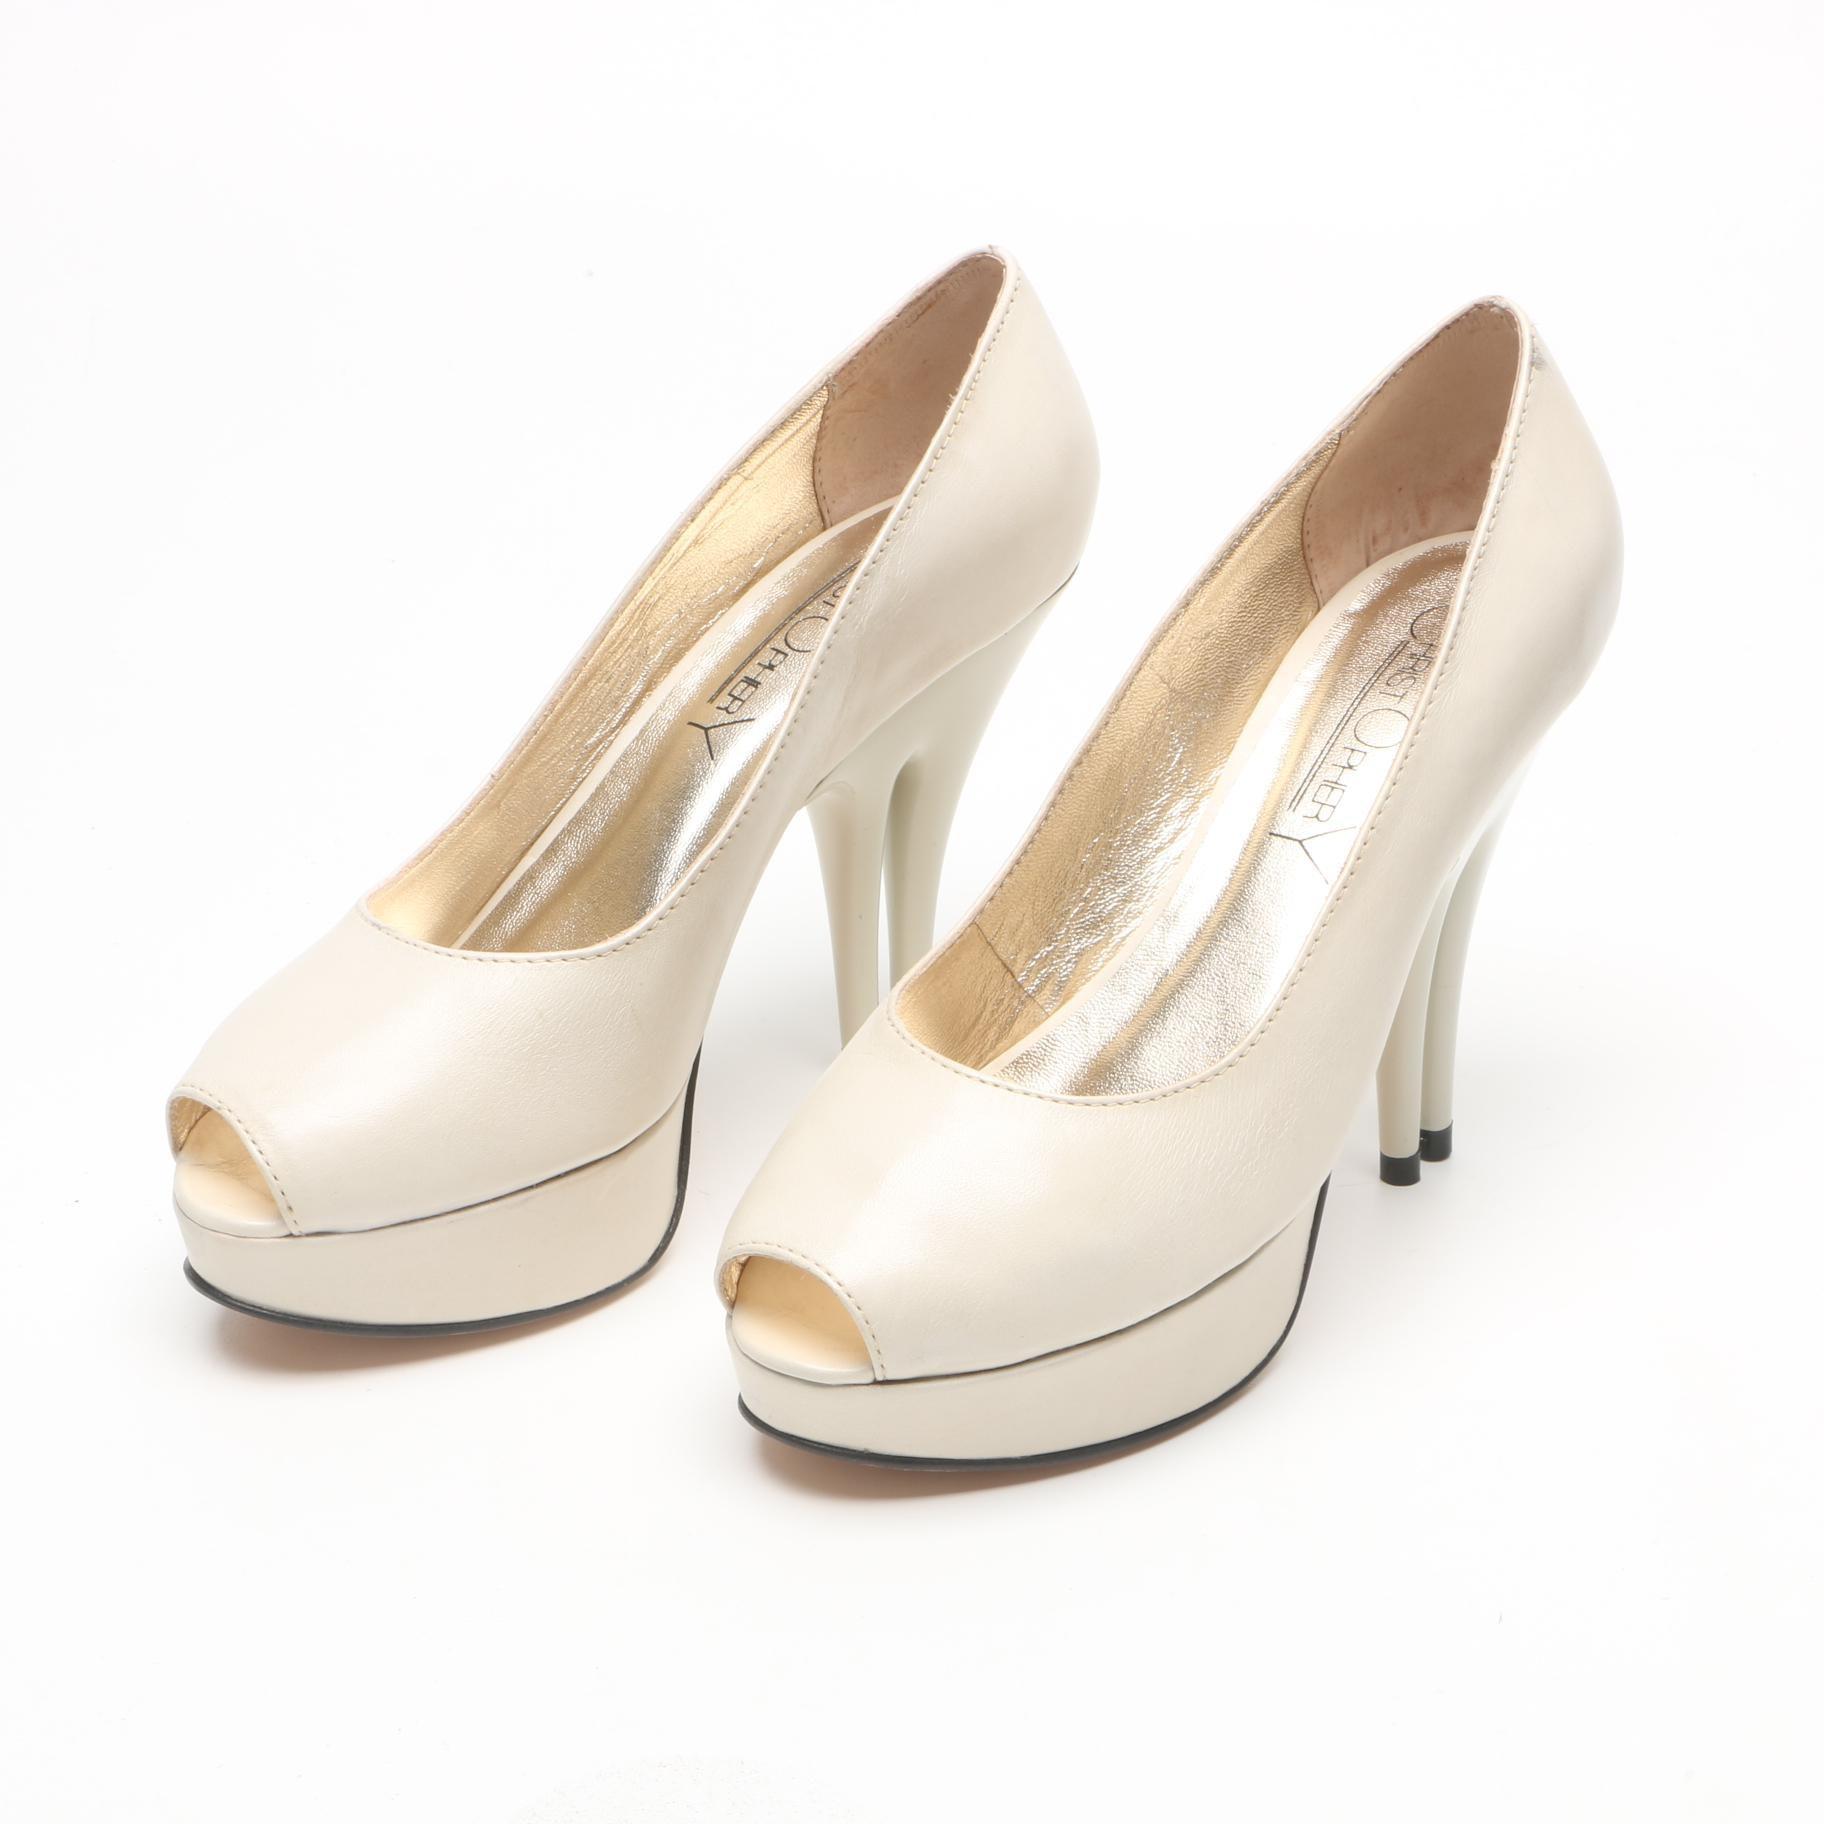 Christopher Coy Ivory Leather Dual Heeled Stilettos